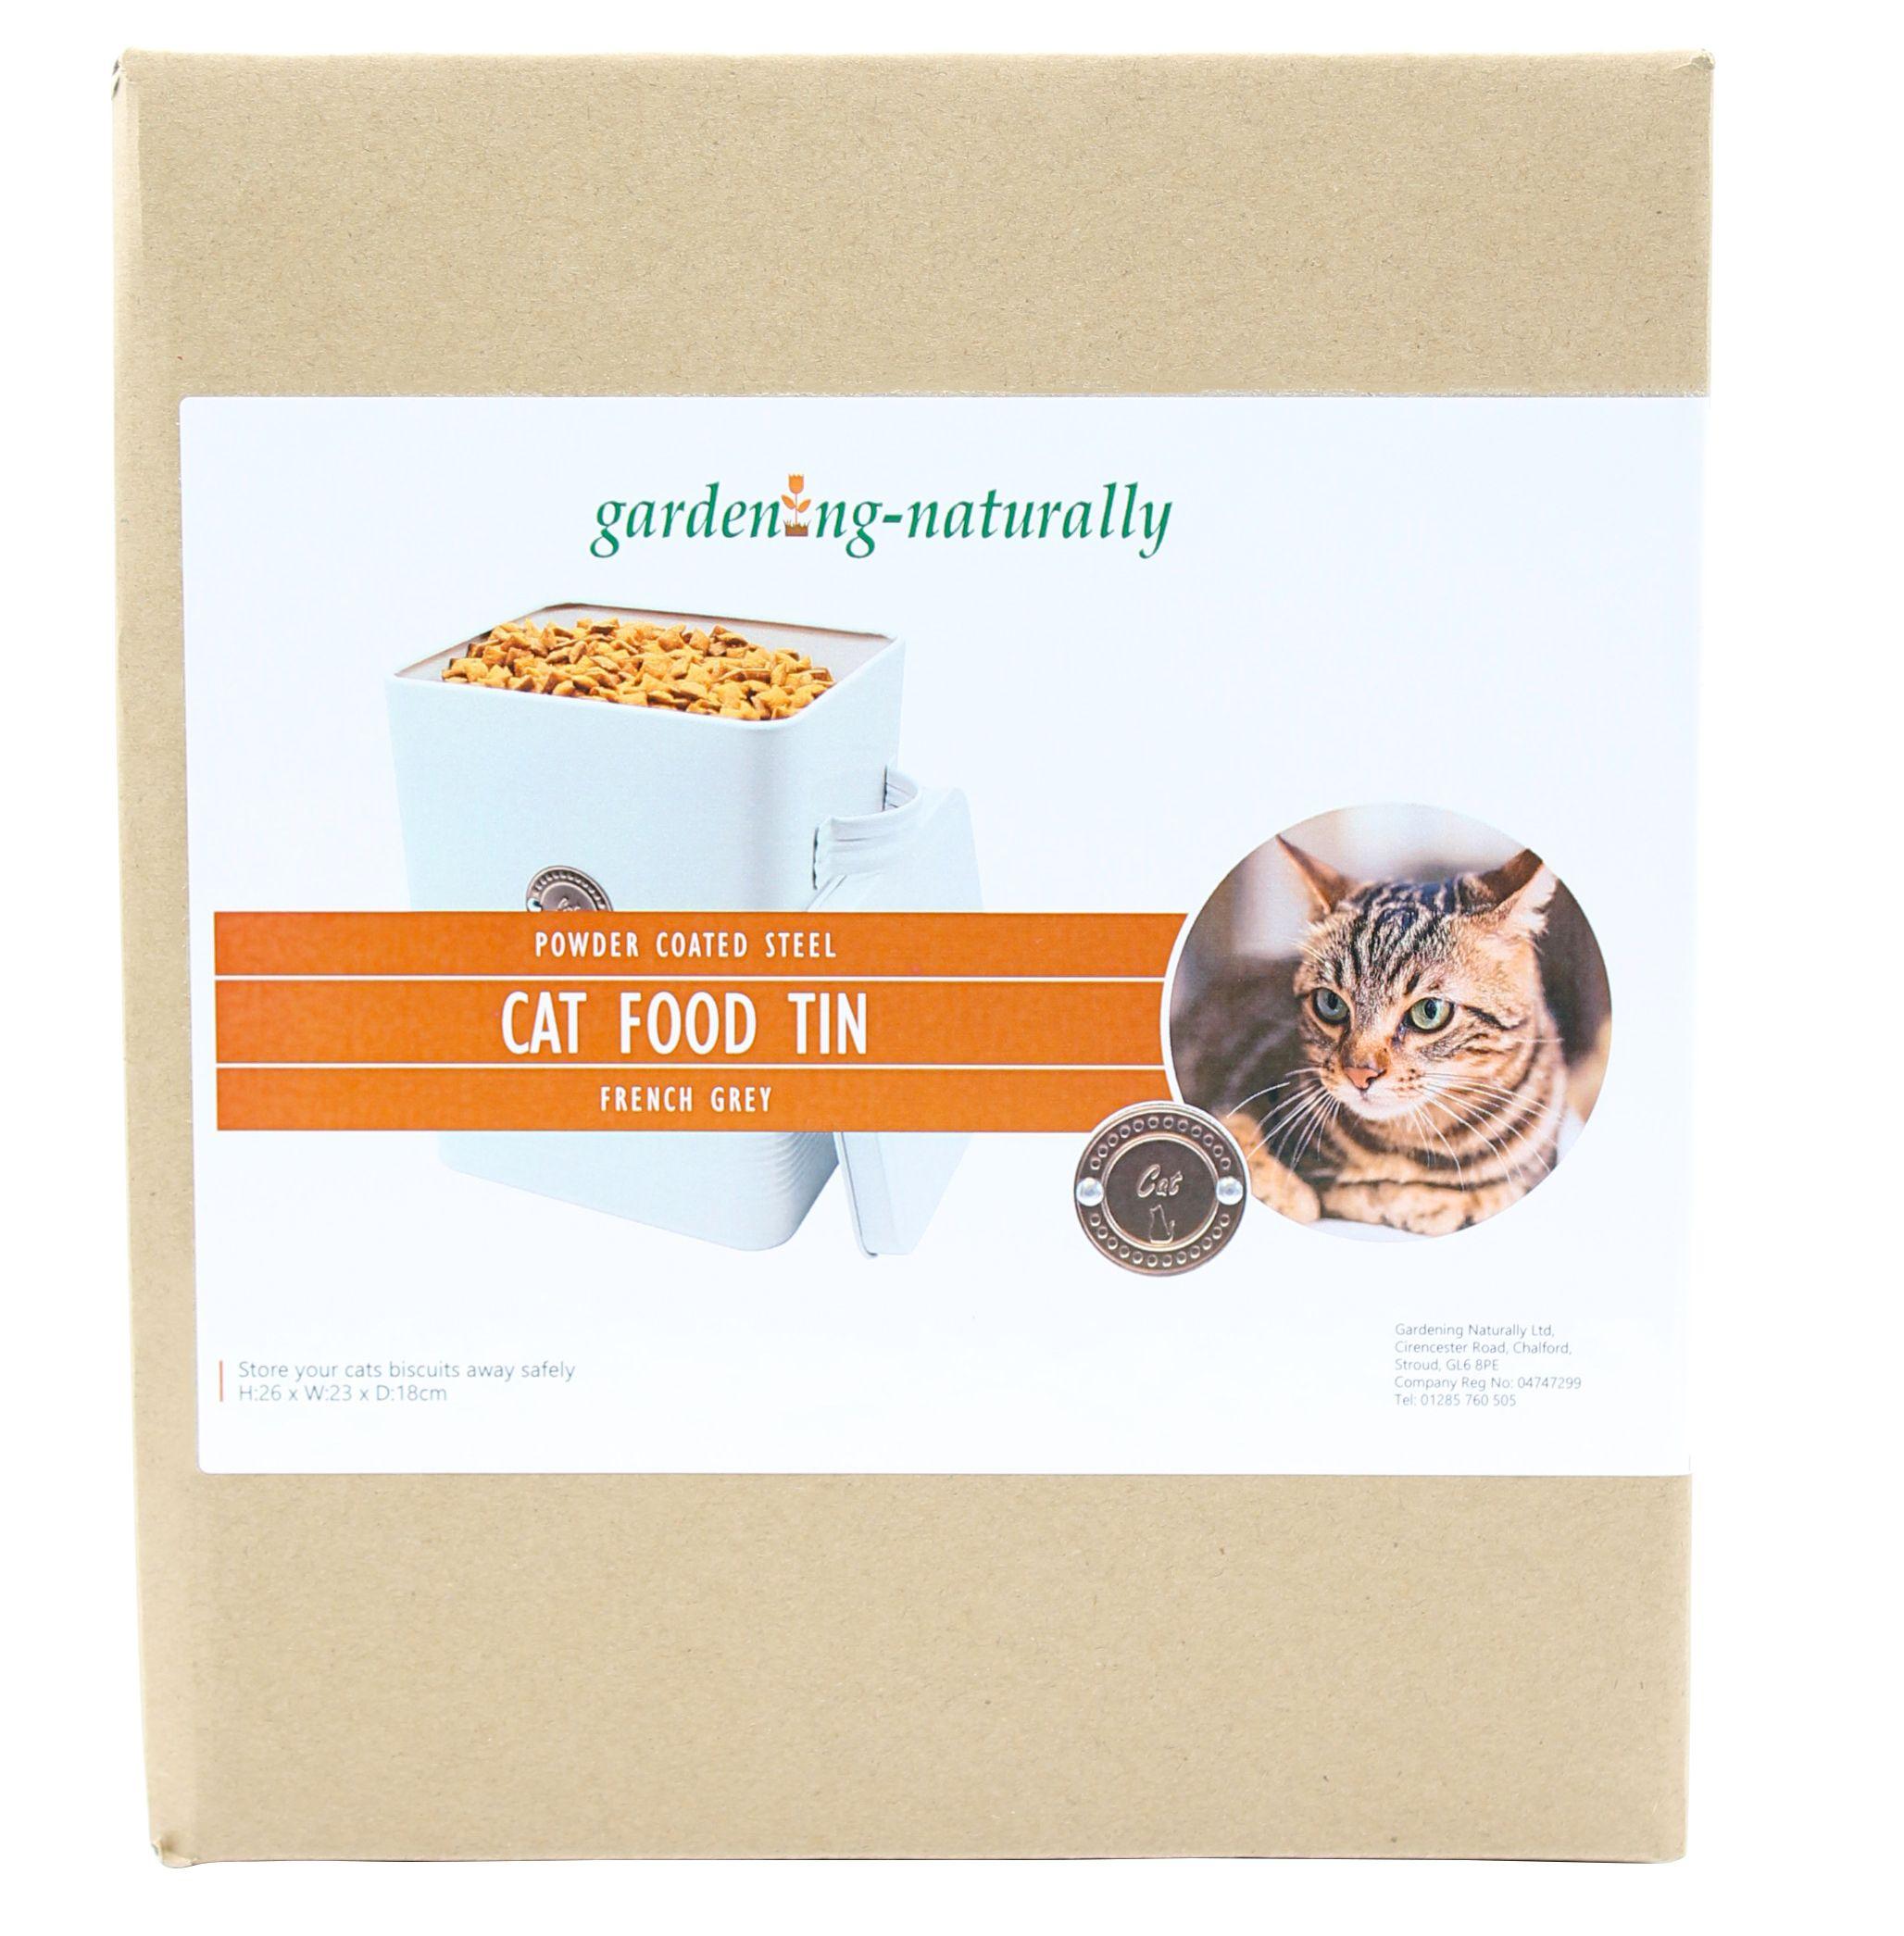 Cat Food Tin (French Grey)